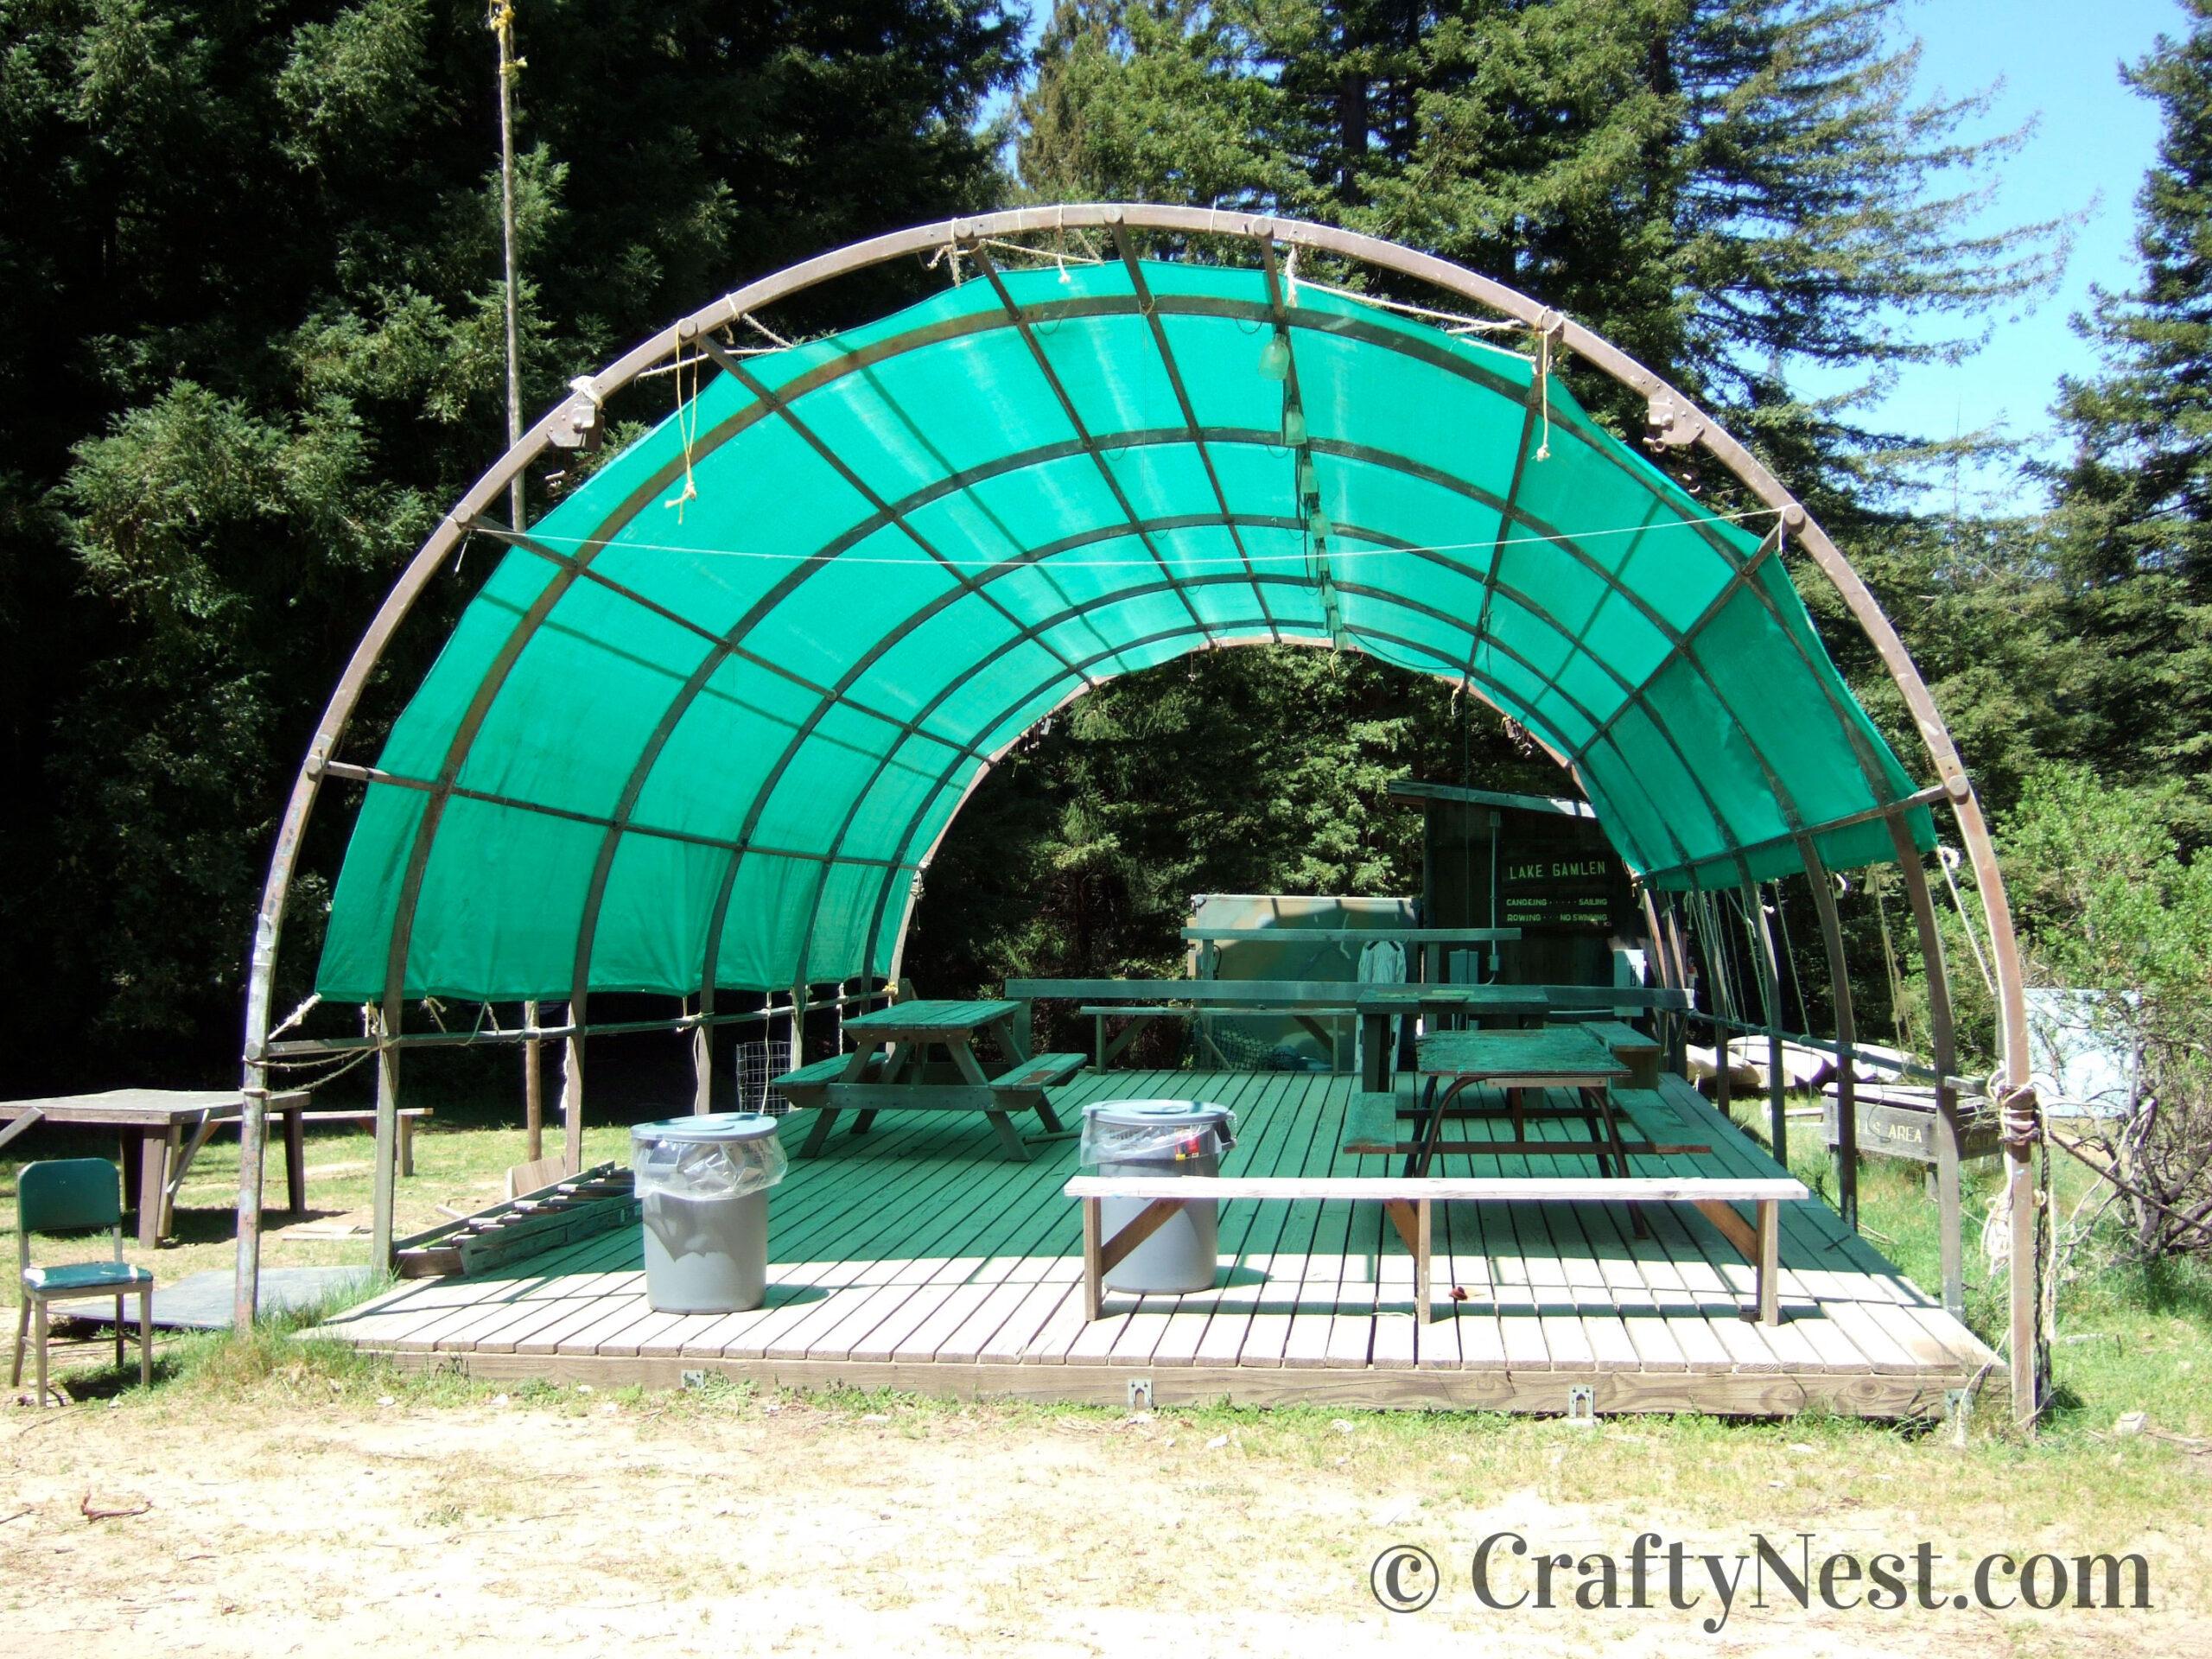 Green quonset hut, photo